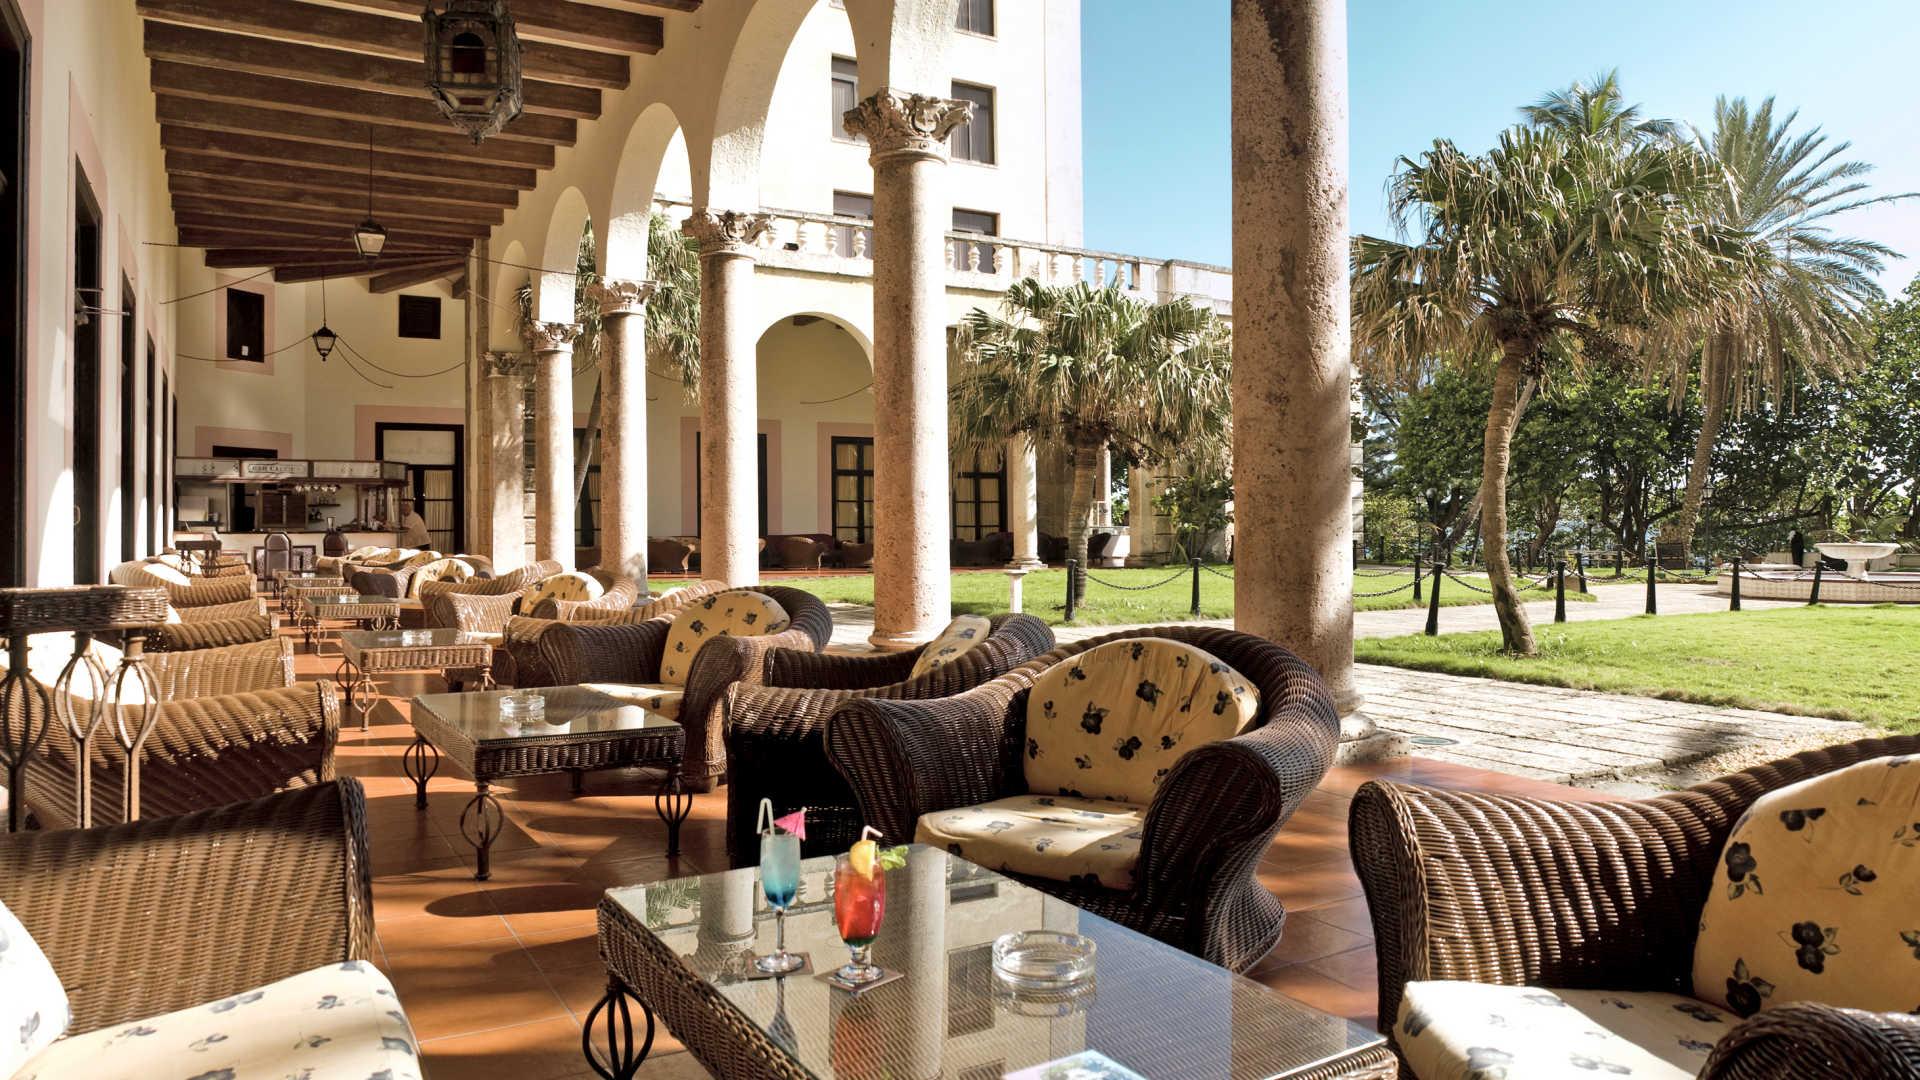 hotel-nacional-de-cuba-23099860-1495541528-ImageGalleryLightboxLarge.jpg